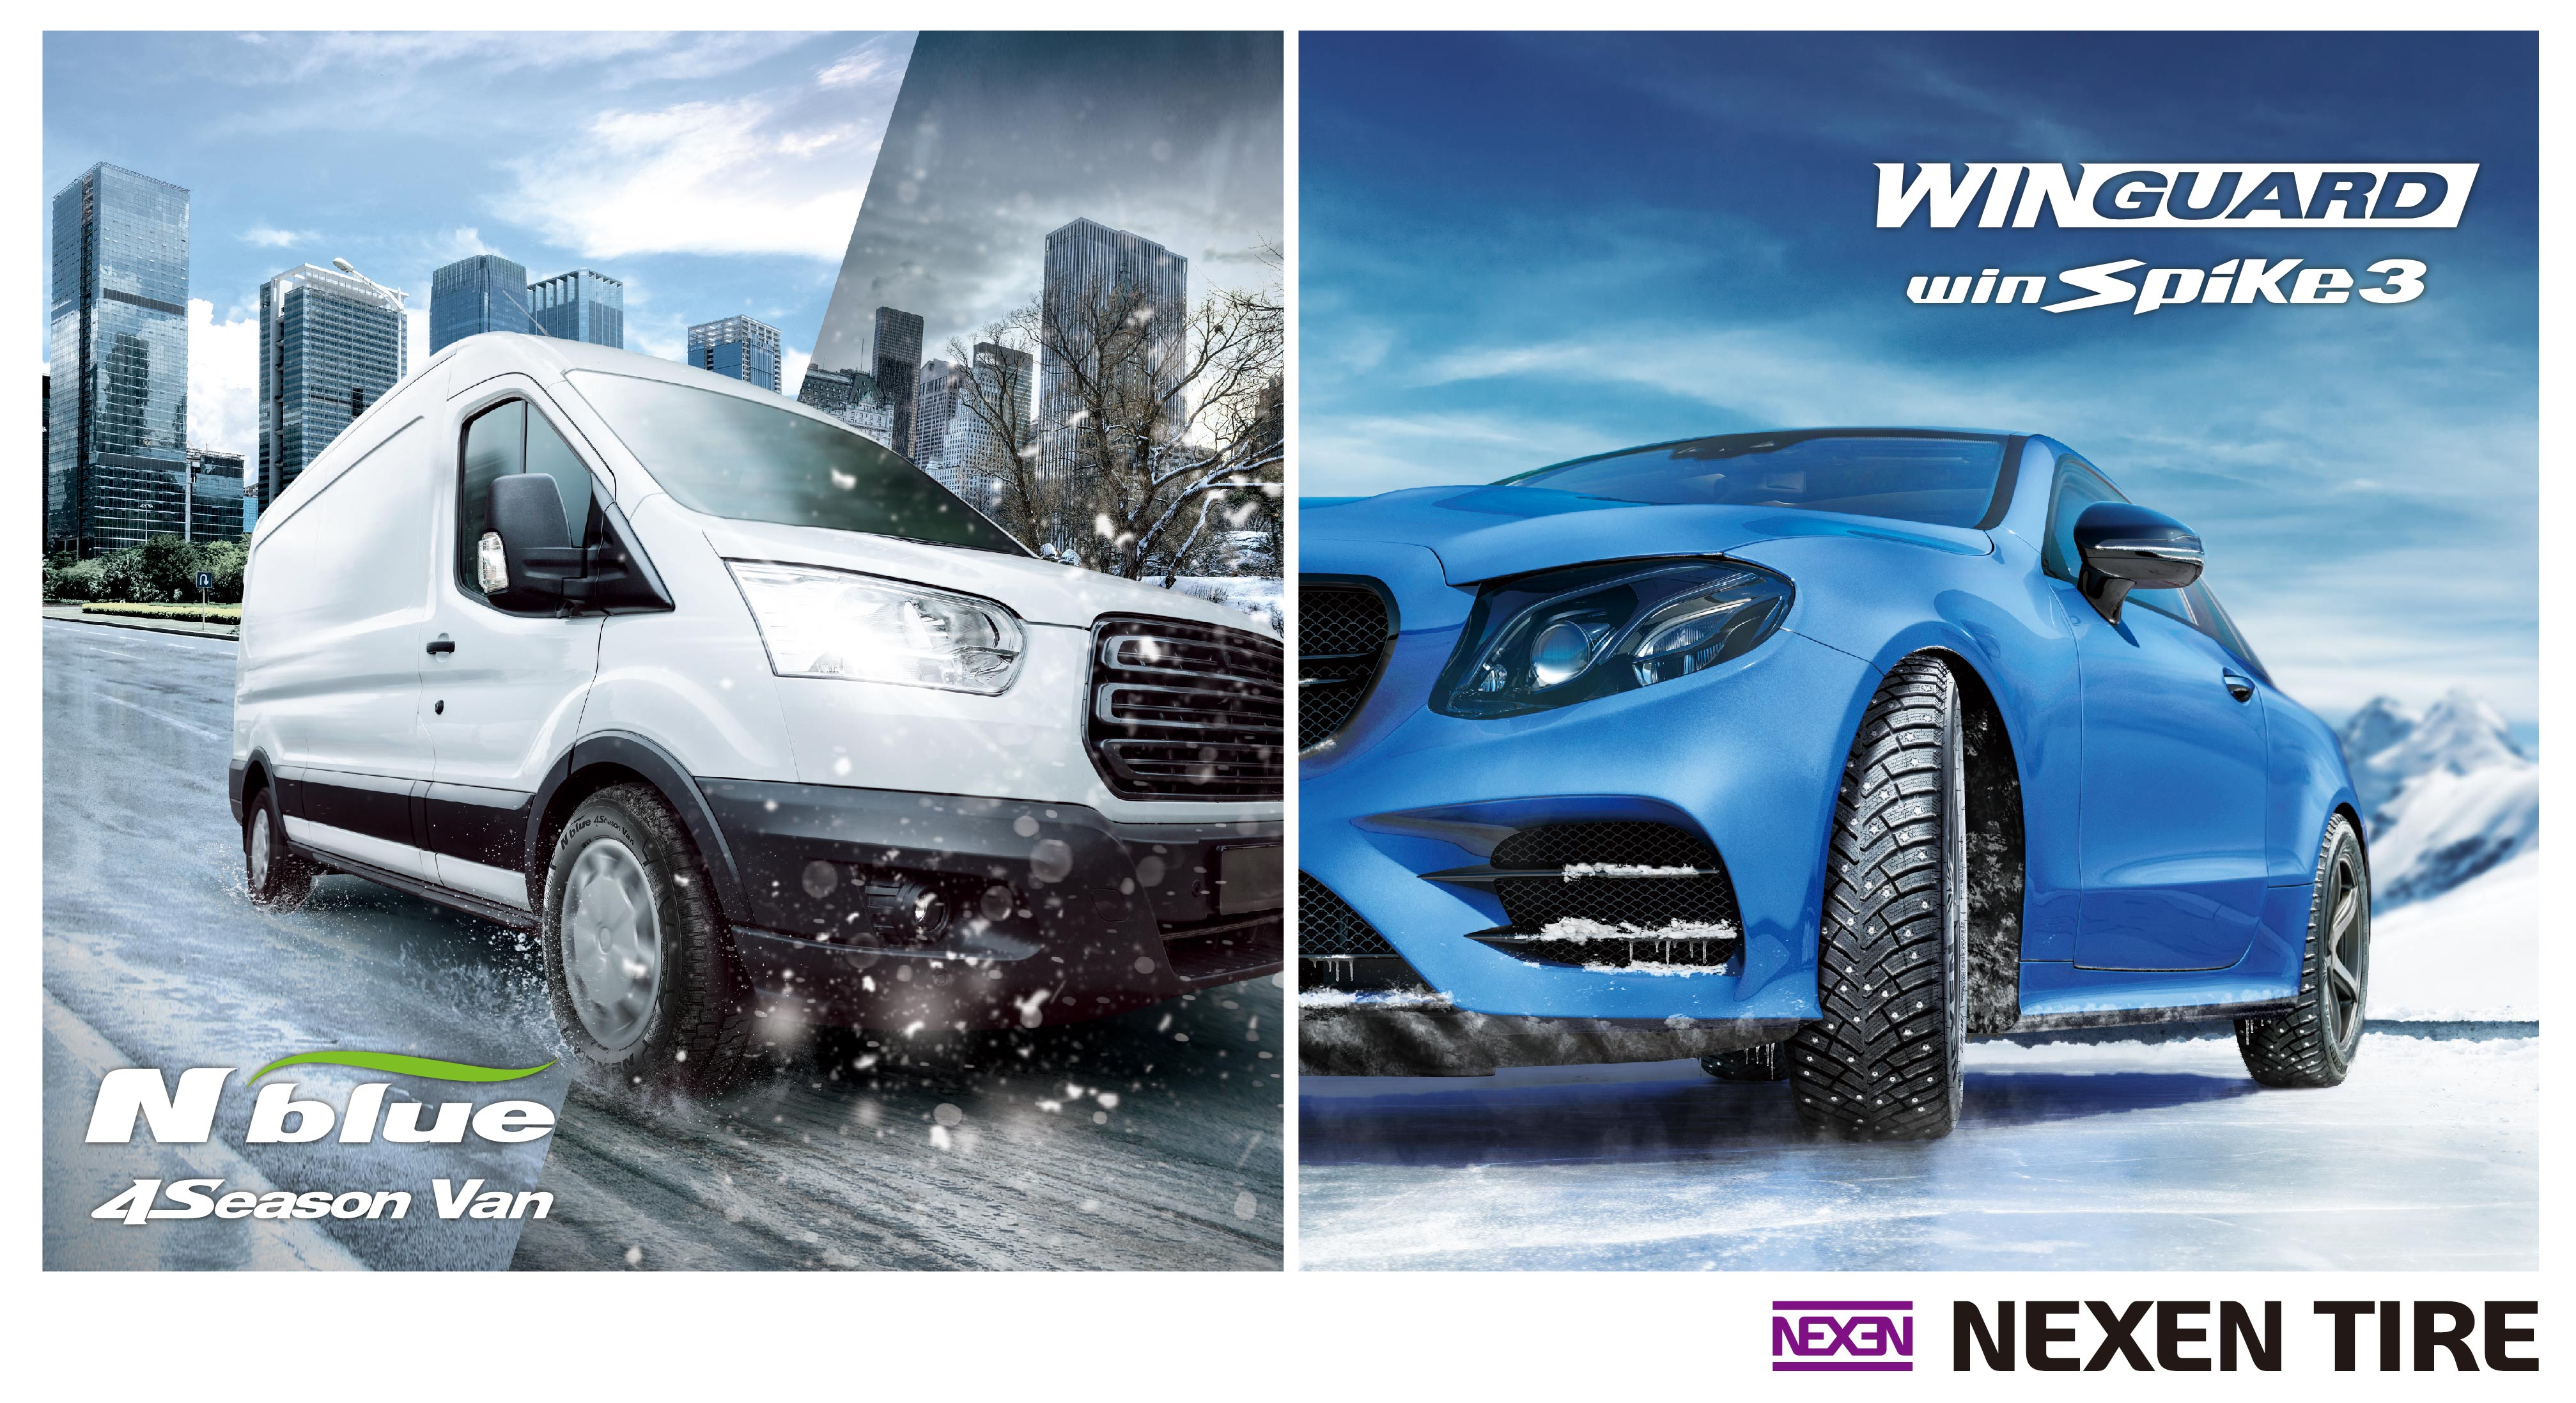 Nexen Tire Launches New All-Season N'blue 4Season Van and Updated WINGUARD winSpike 3 Winter Tyres in European Market